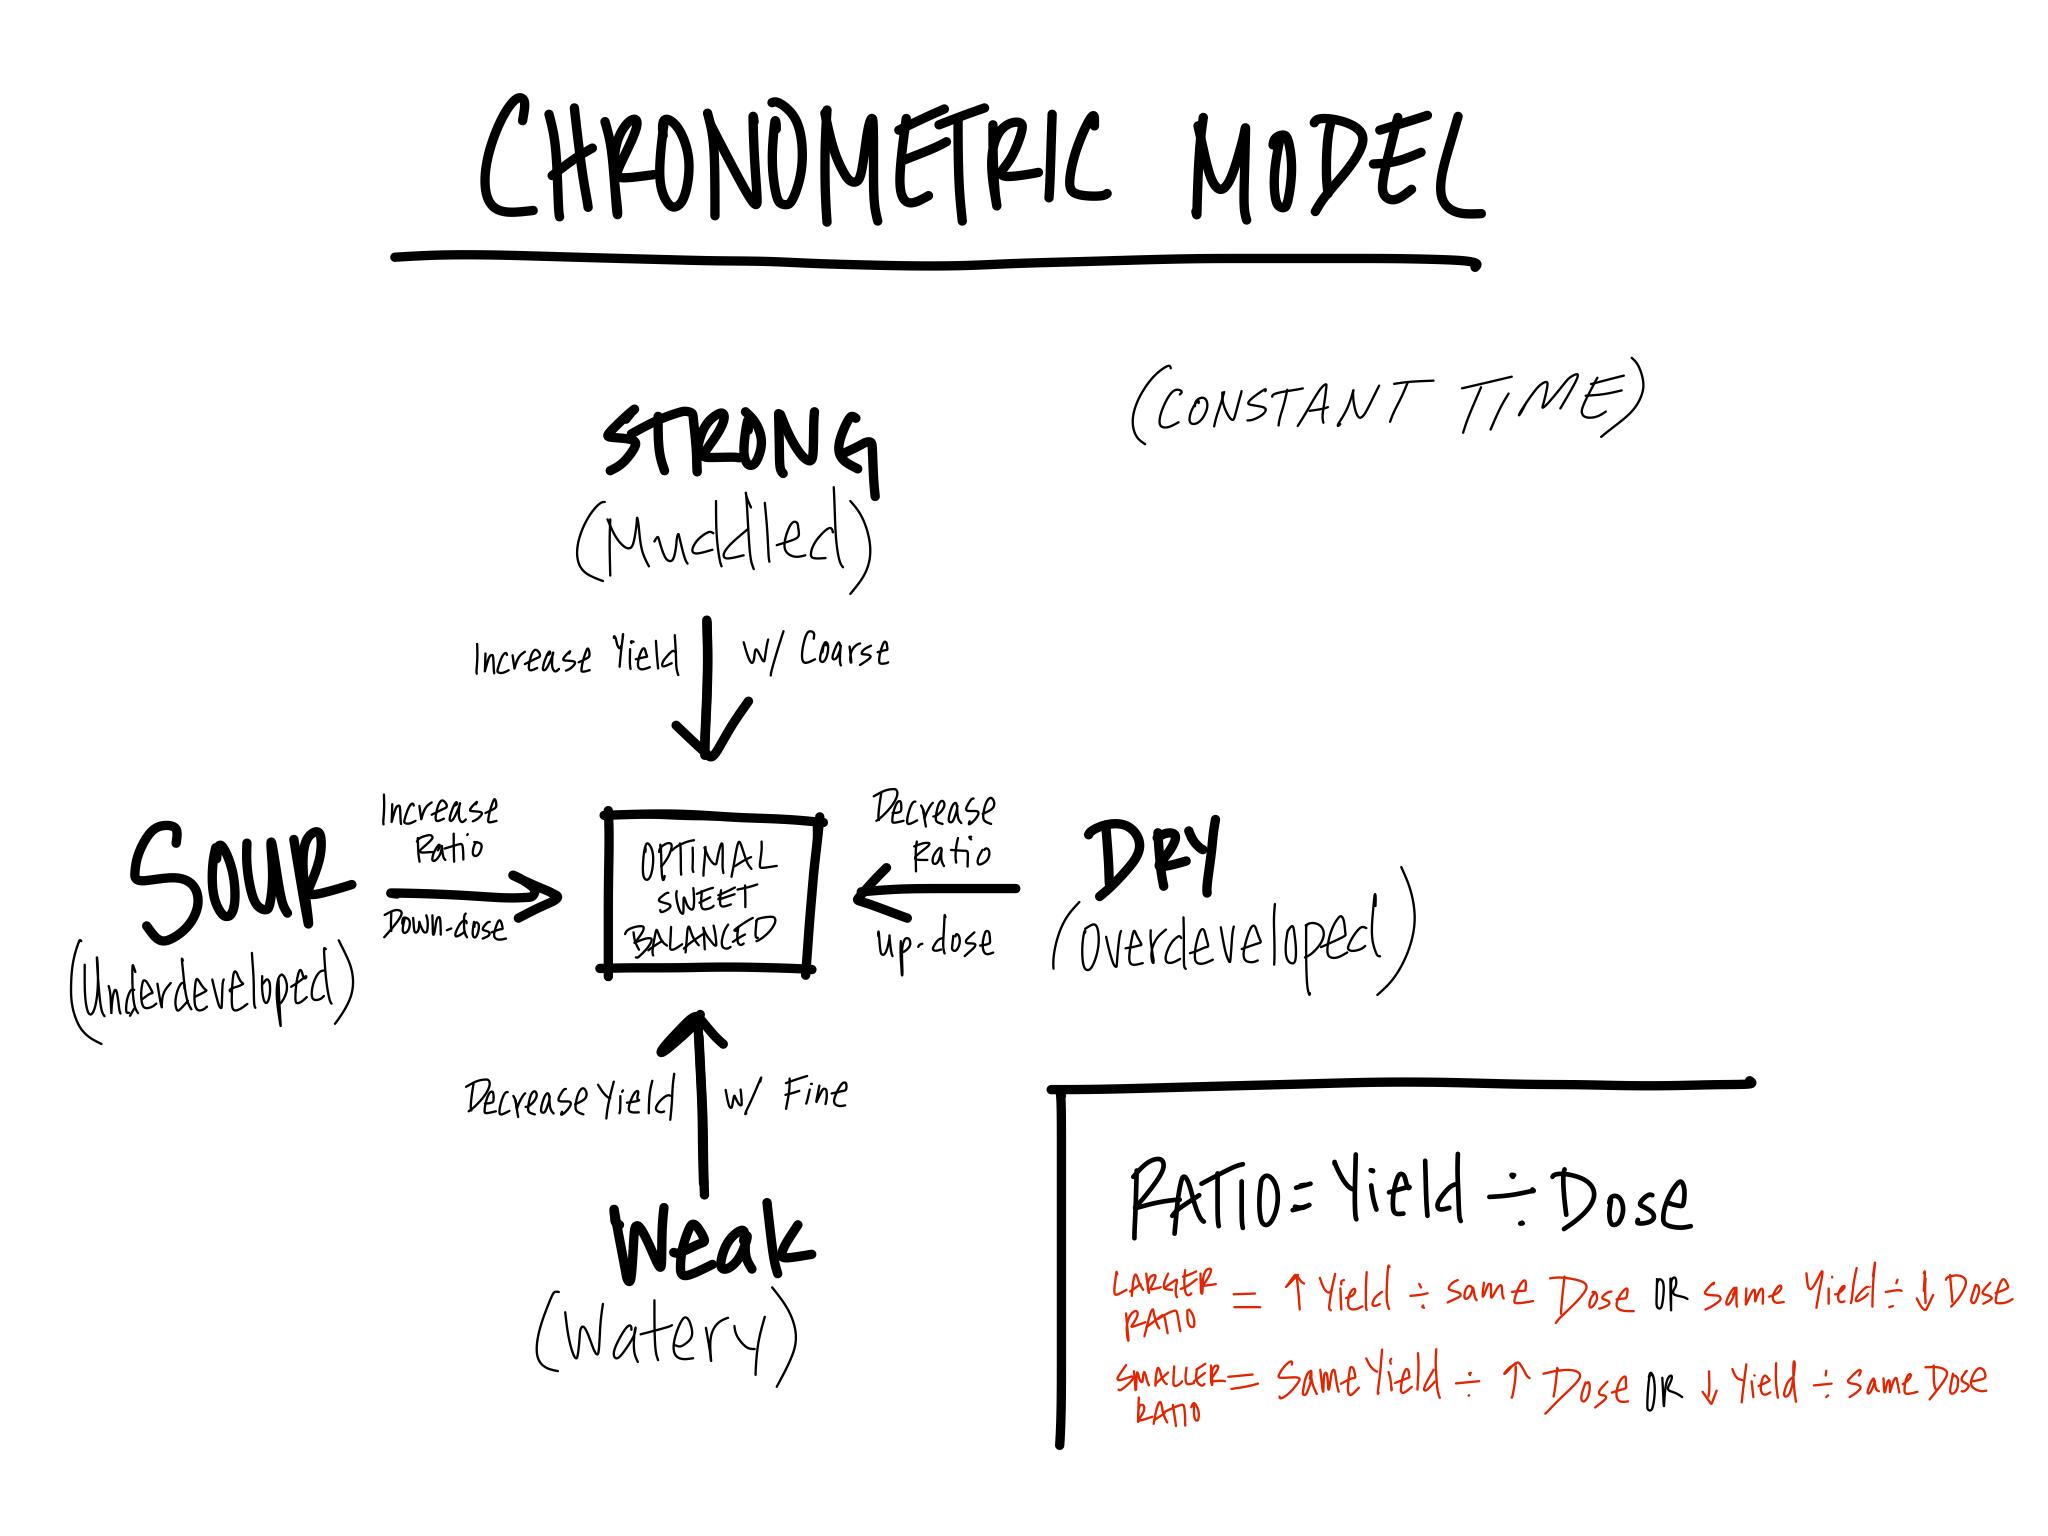 Chronometric Model